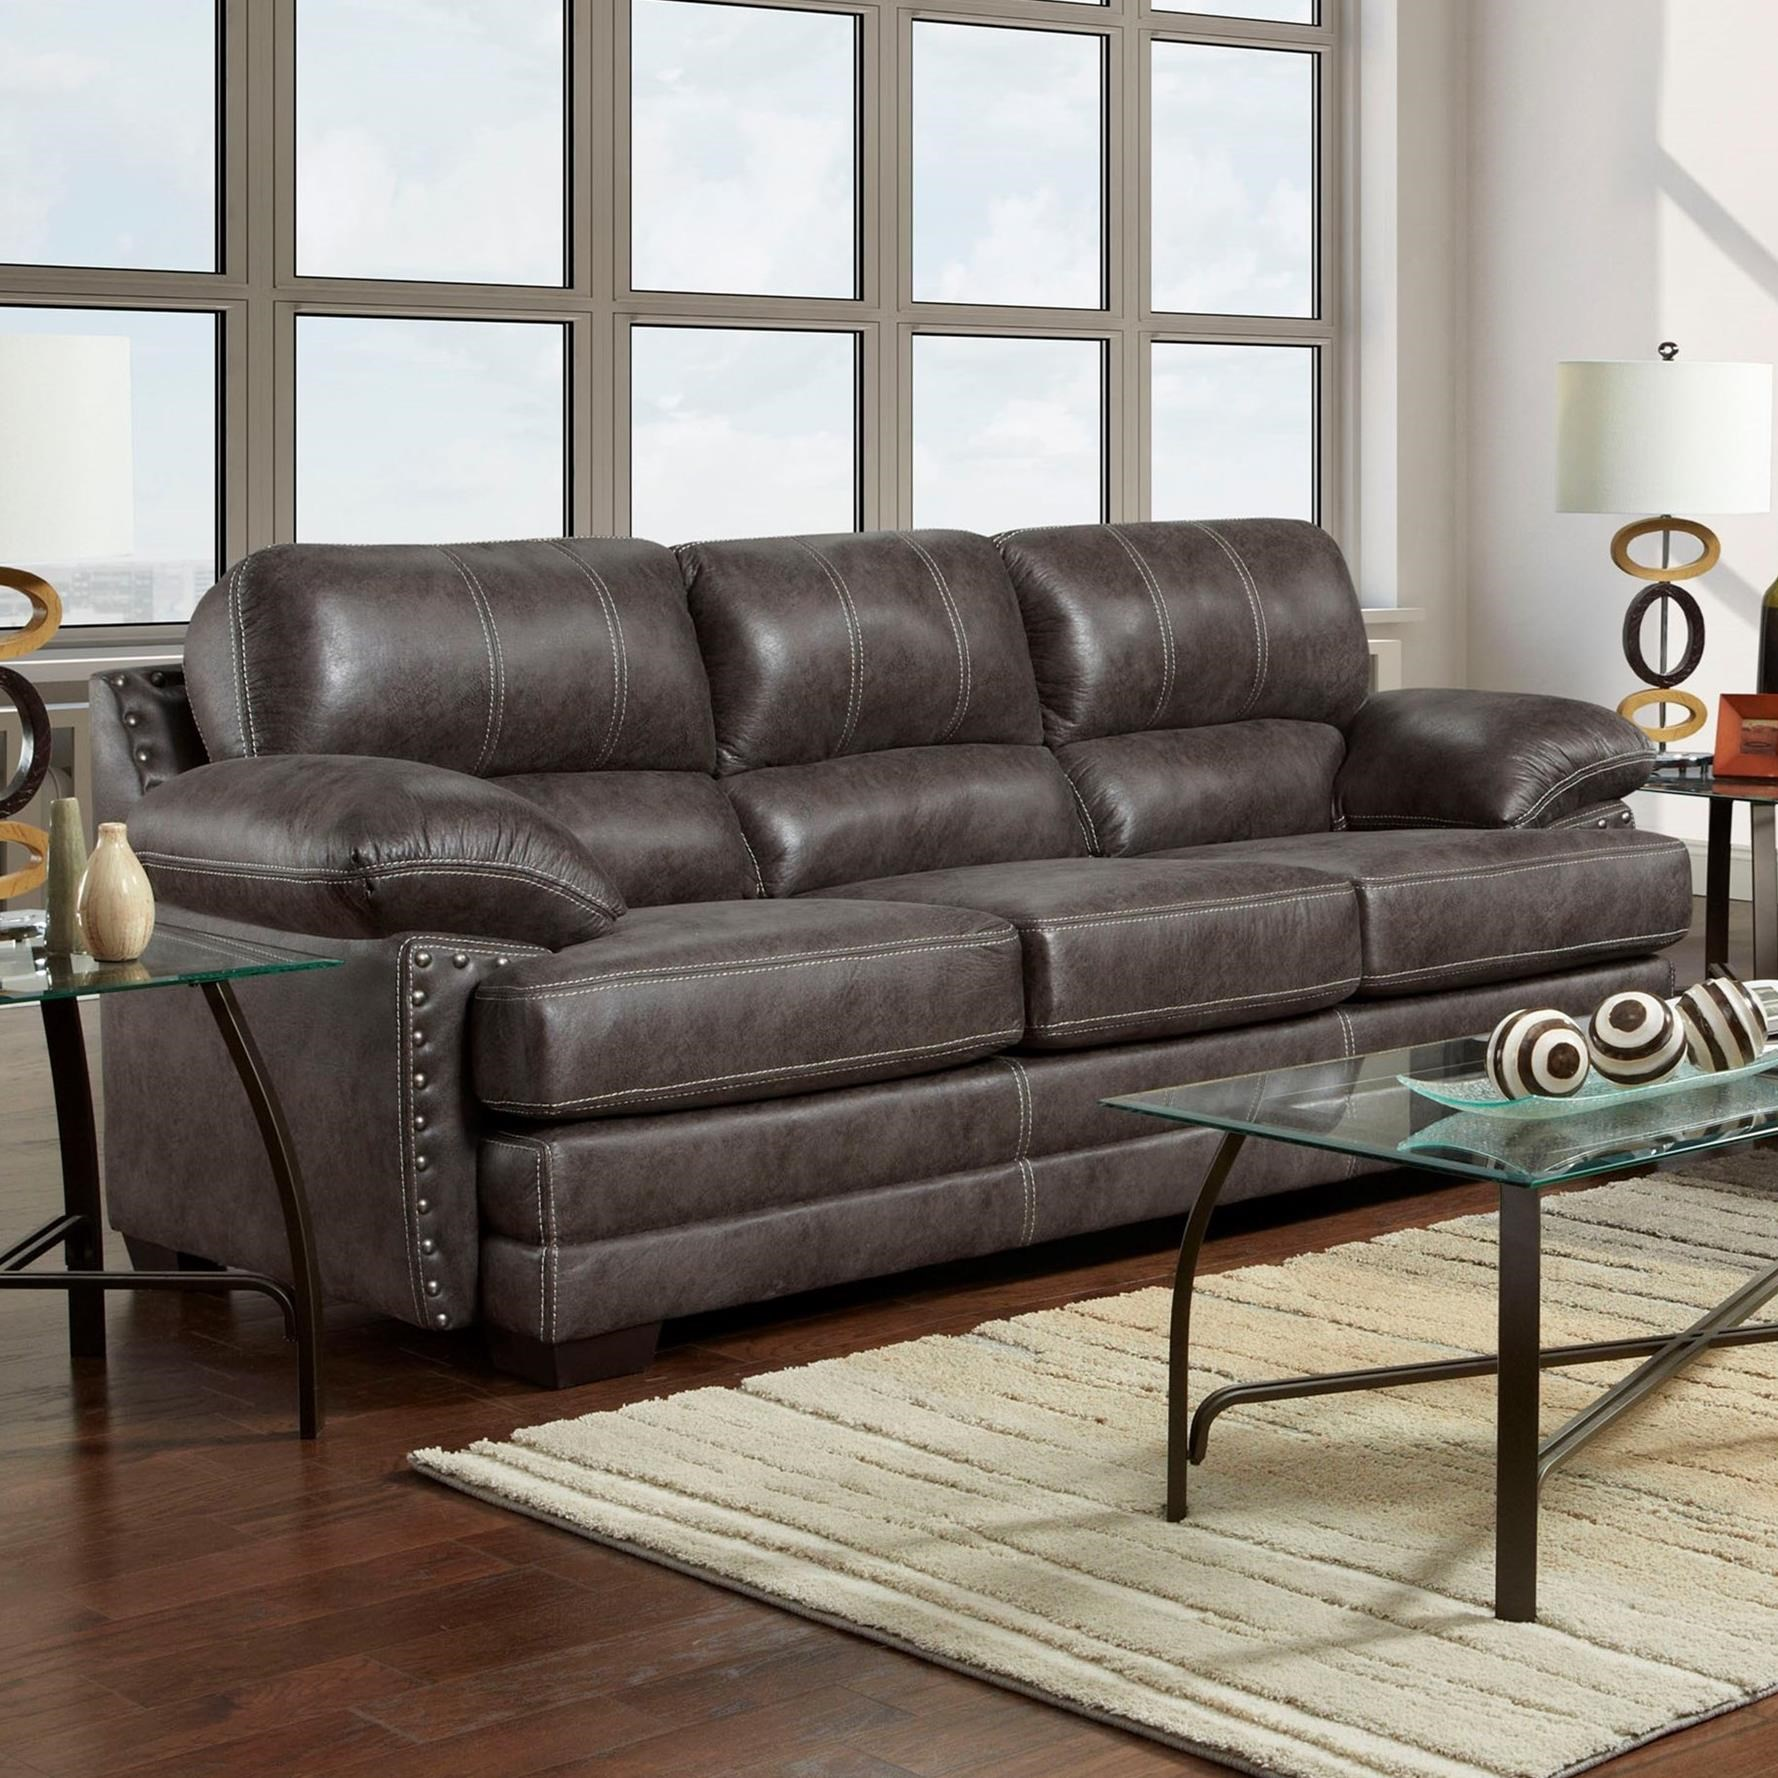 Washington Furniture 1650 Sofa - Item Number: 1653-693-Nevada Ash